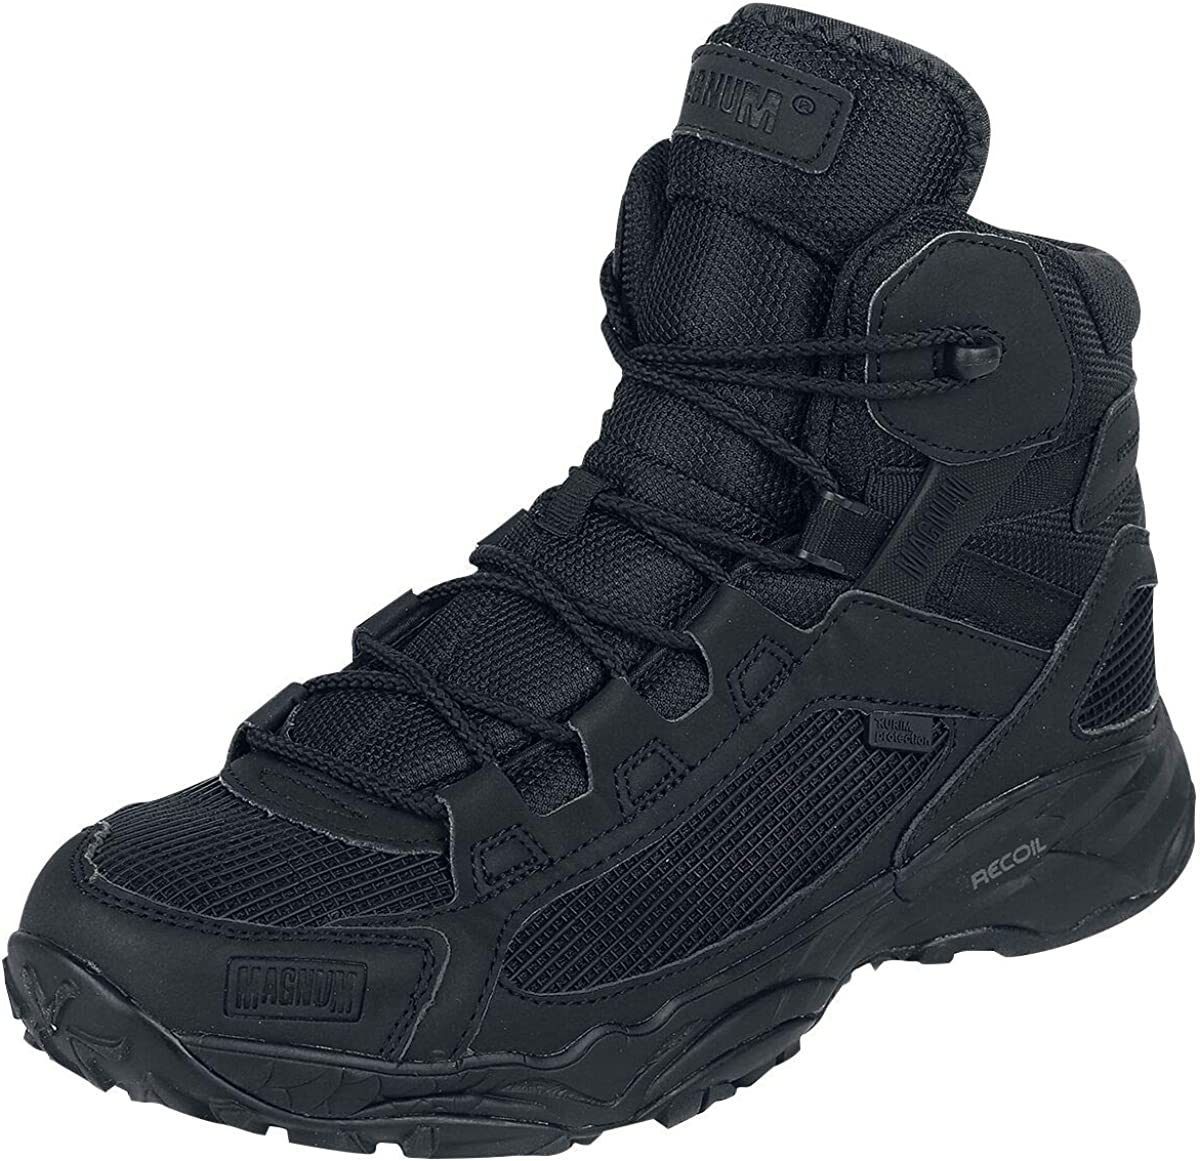 Ranking Wholesale TOP3 Magnum Opus Assault Tactical 5.0 Boots Black